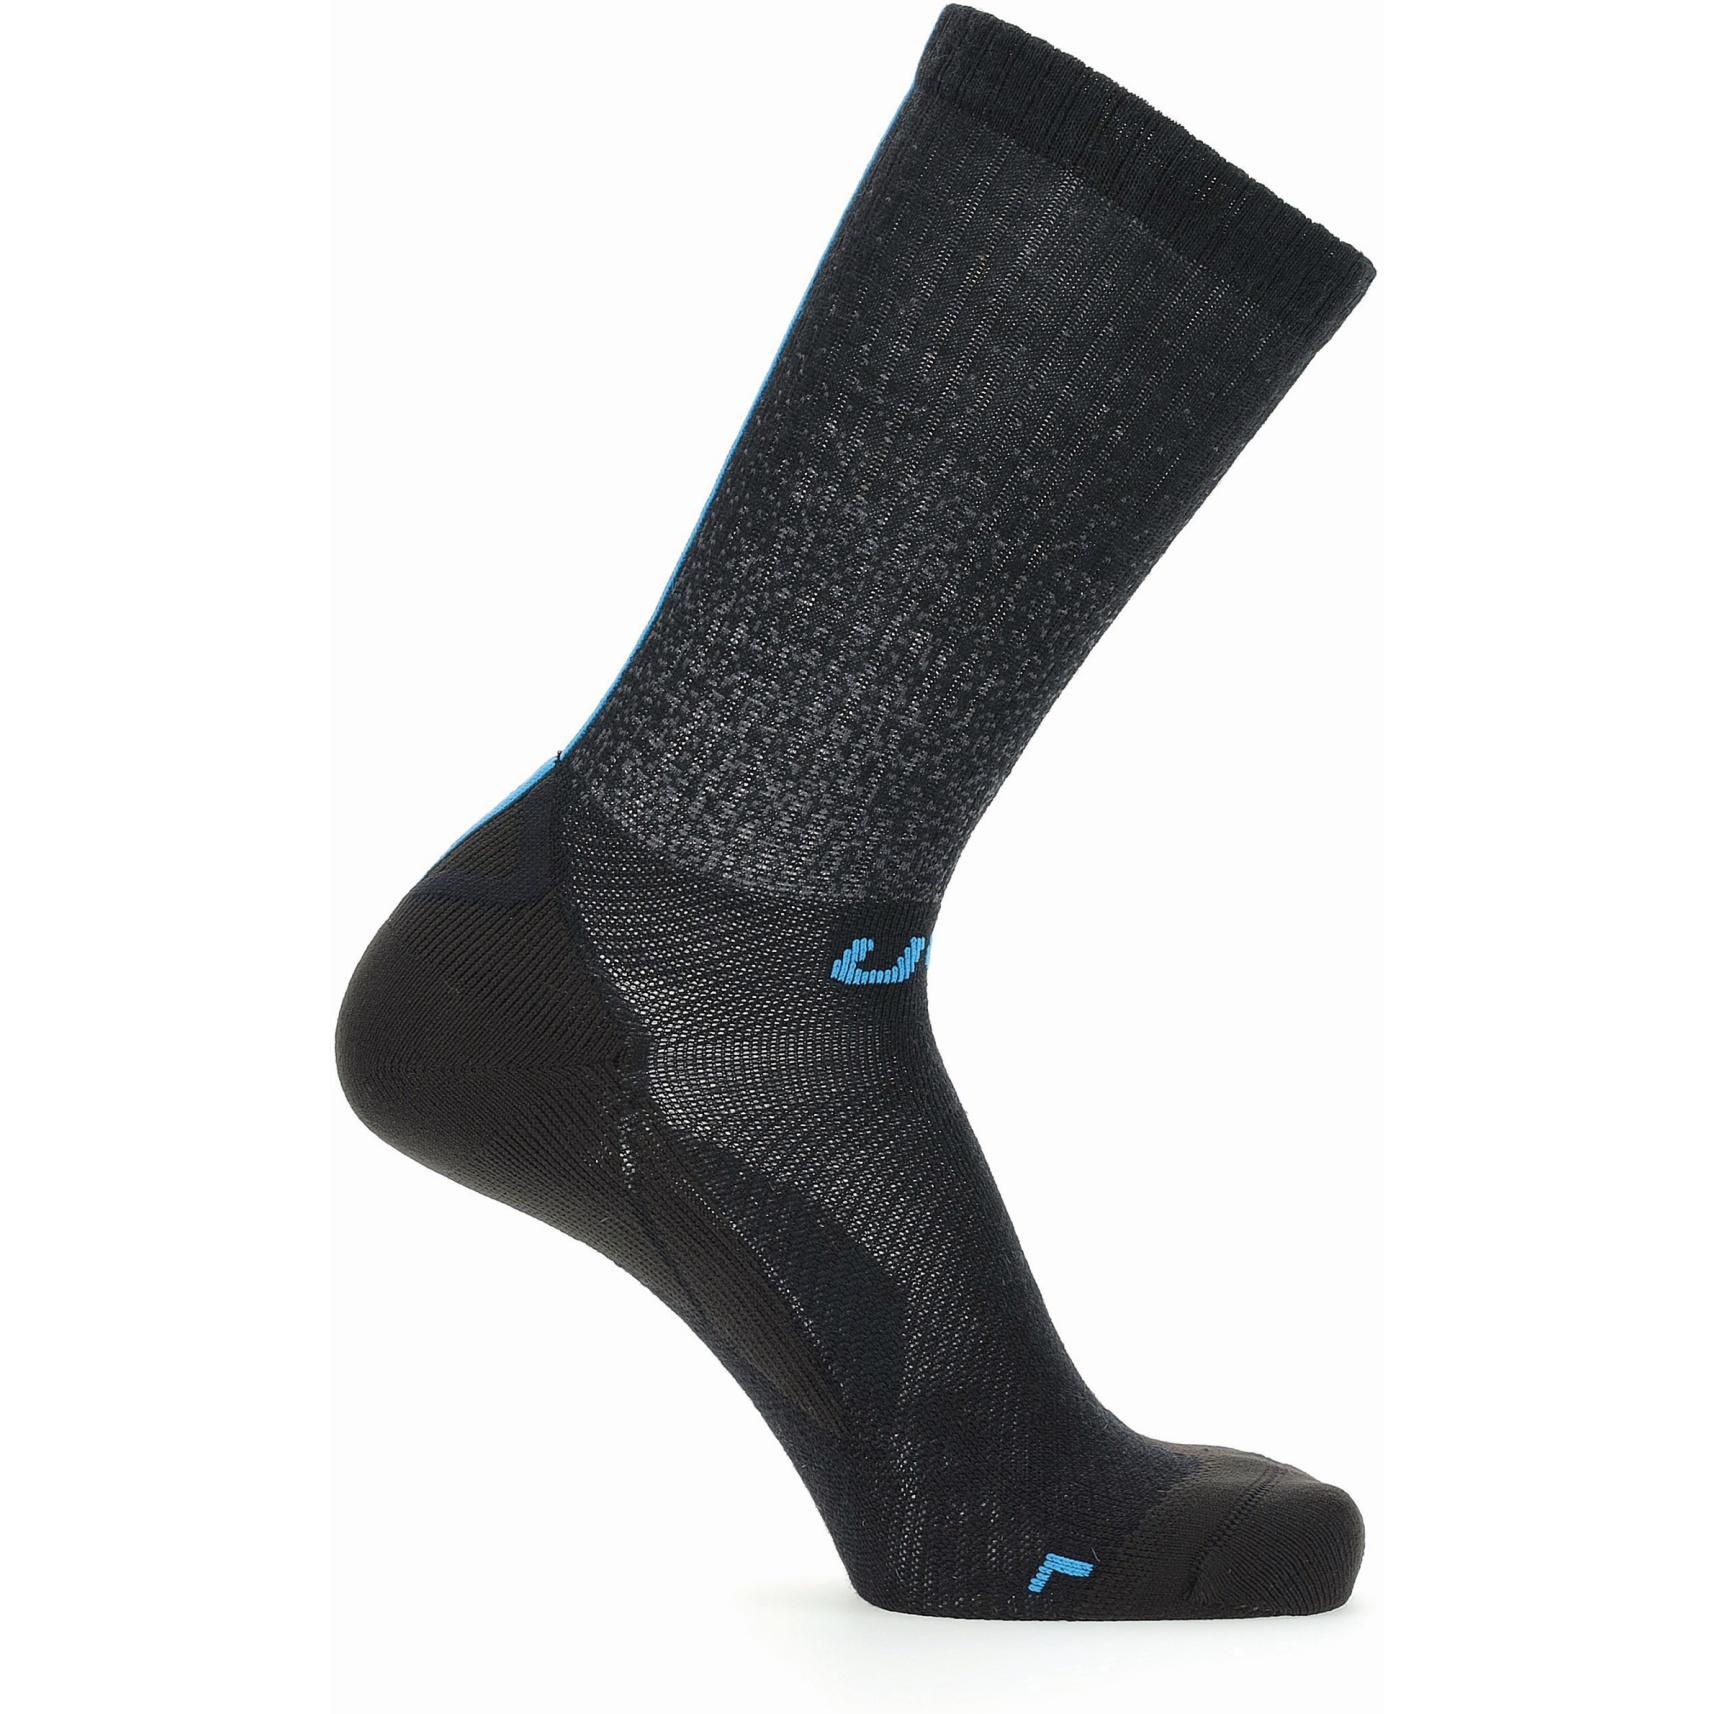 Image of UYN Cycling Aero Winter Socks - Black/Turquoise